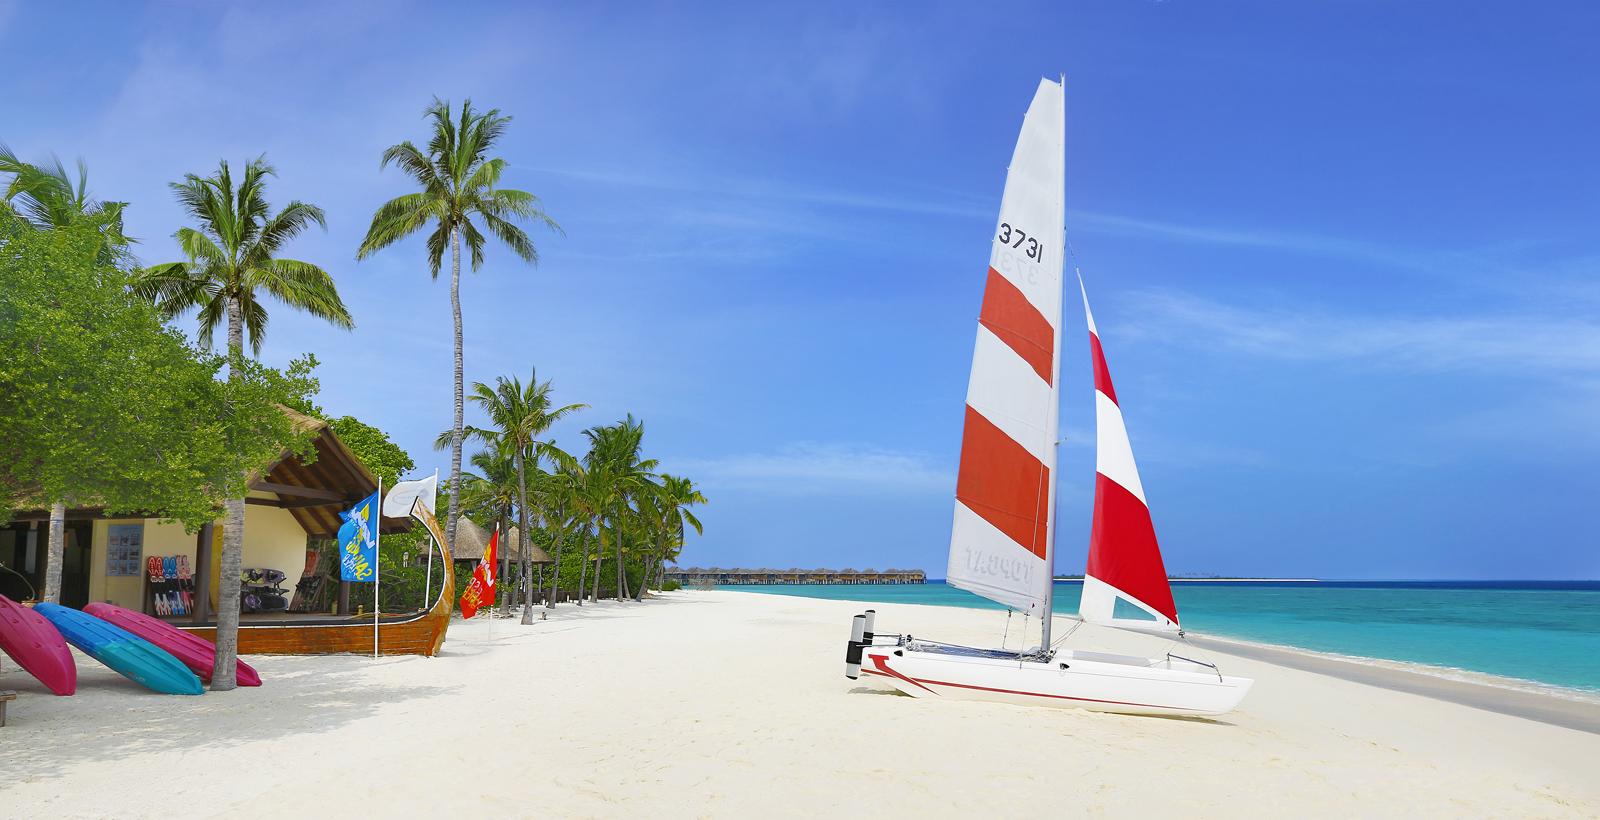 Celebrate a tropical festive season and JA Manafaru Maldives Image